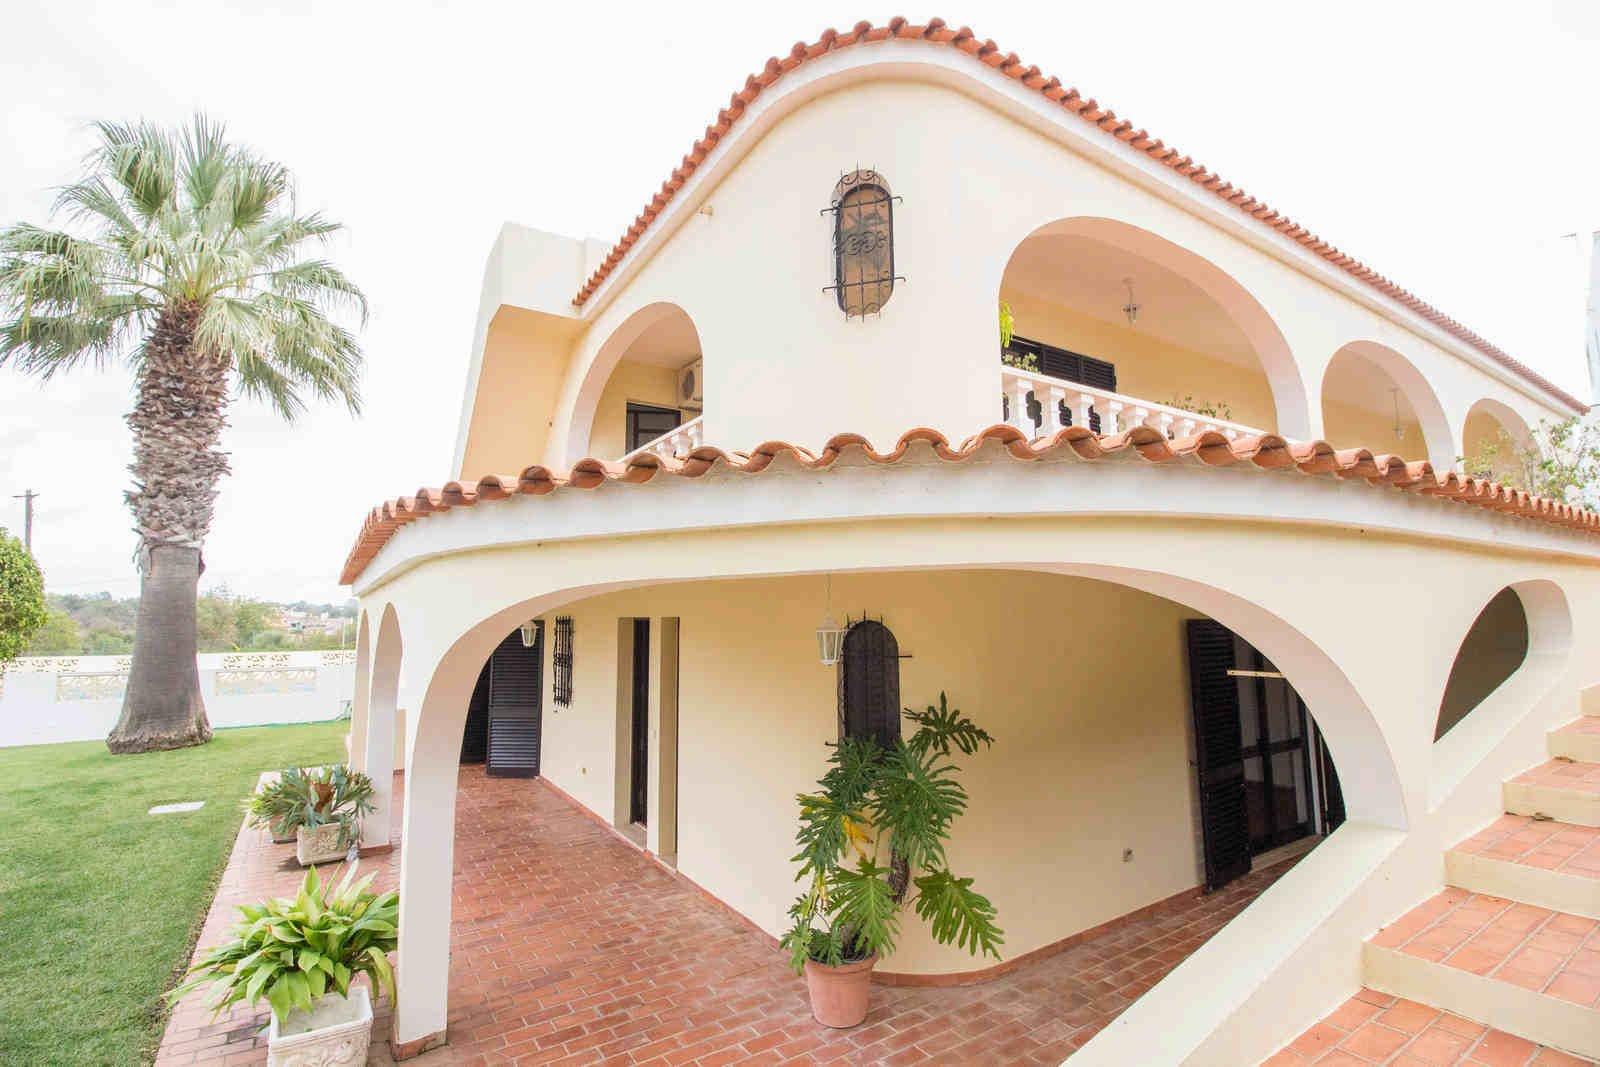 5 Bedroom Villa Almancil, Central Algarve Ref: PV3528